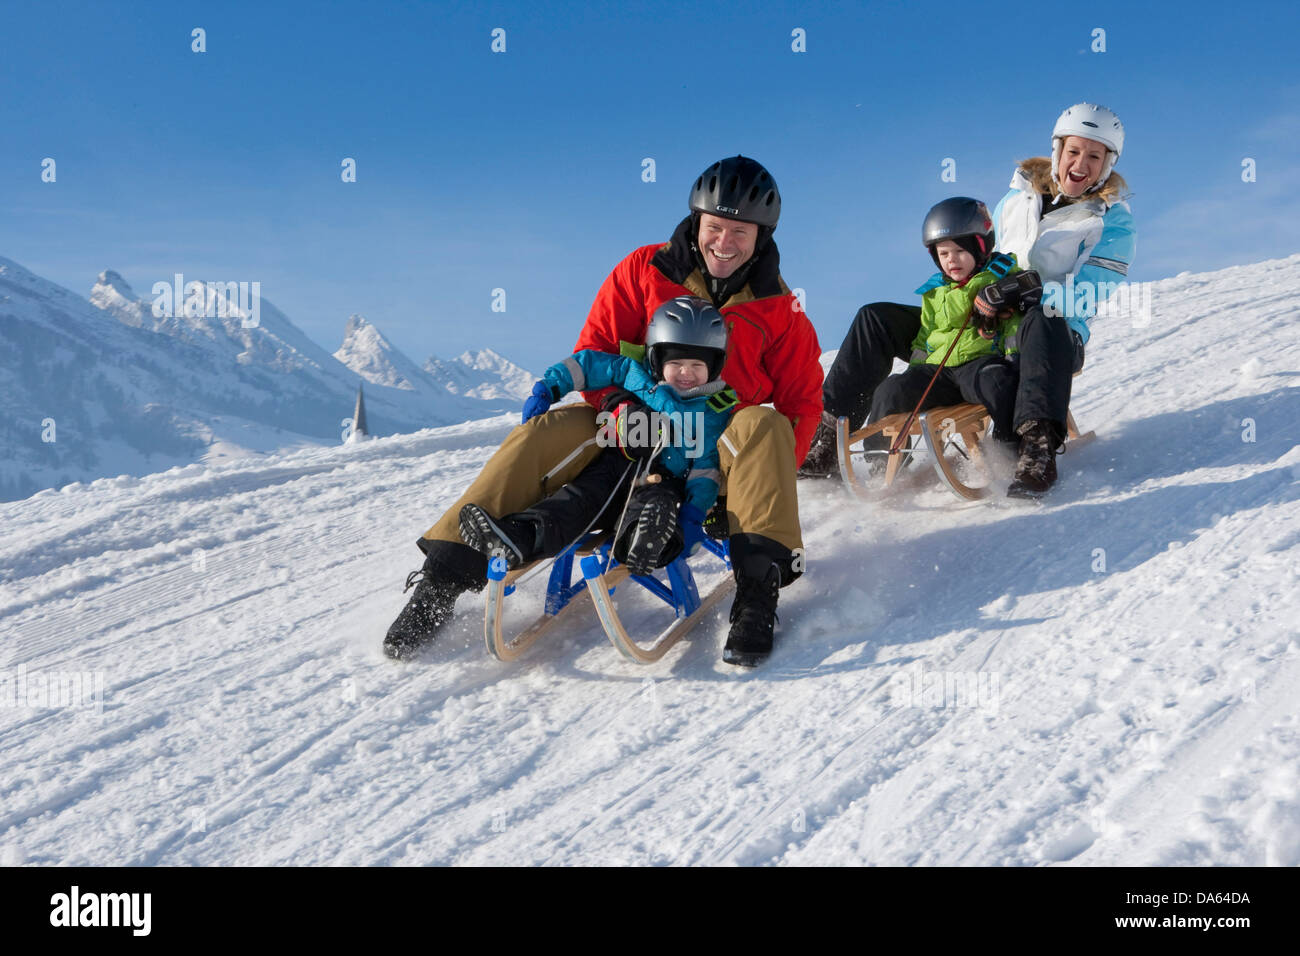 ride, toboggan, sledging, Gamplüt, Wildhaus, Churfirsten, mountain, mountains, family, sledge, sleigh, sport, - Stock Image